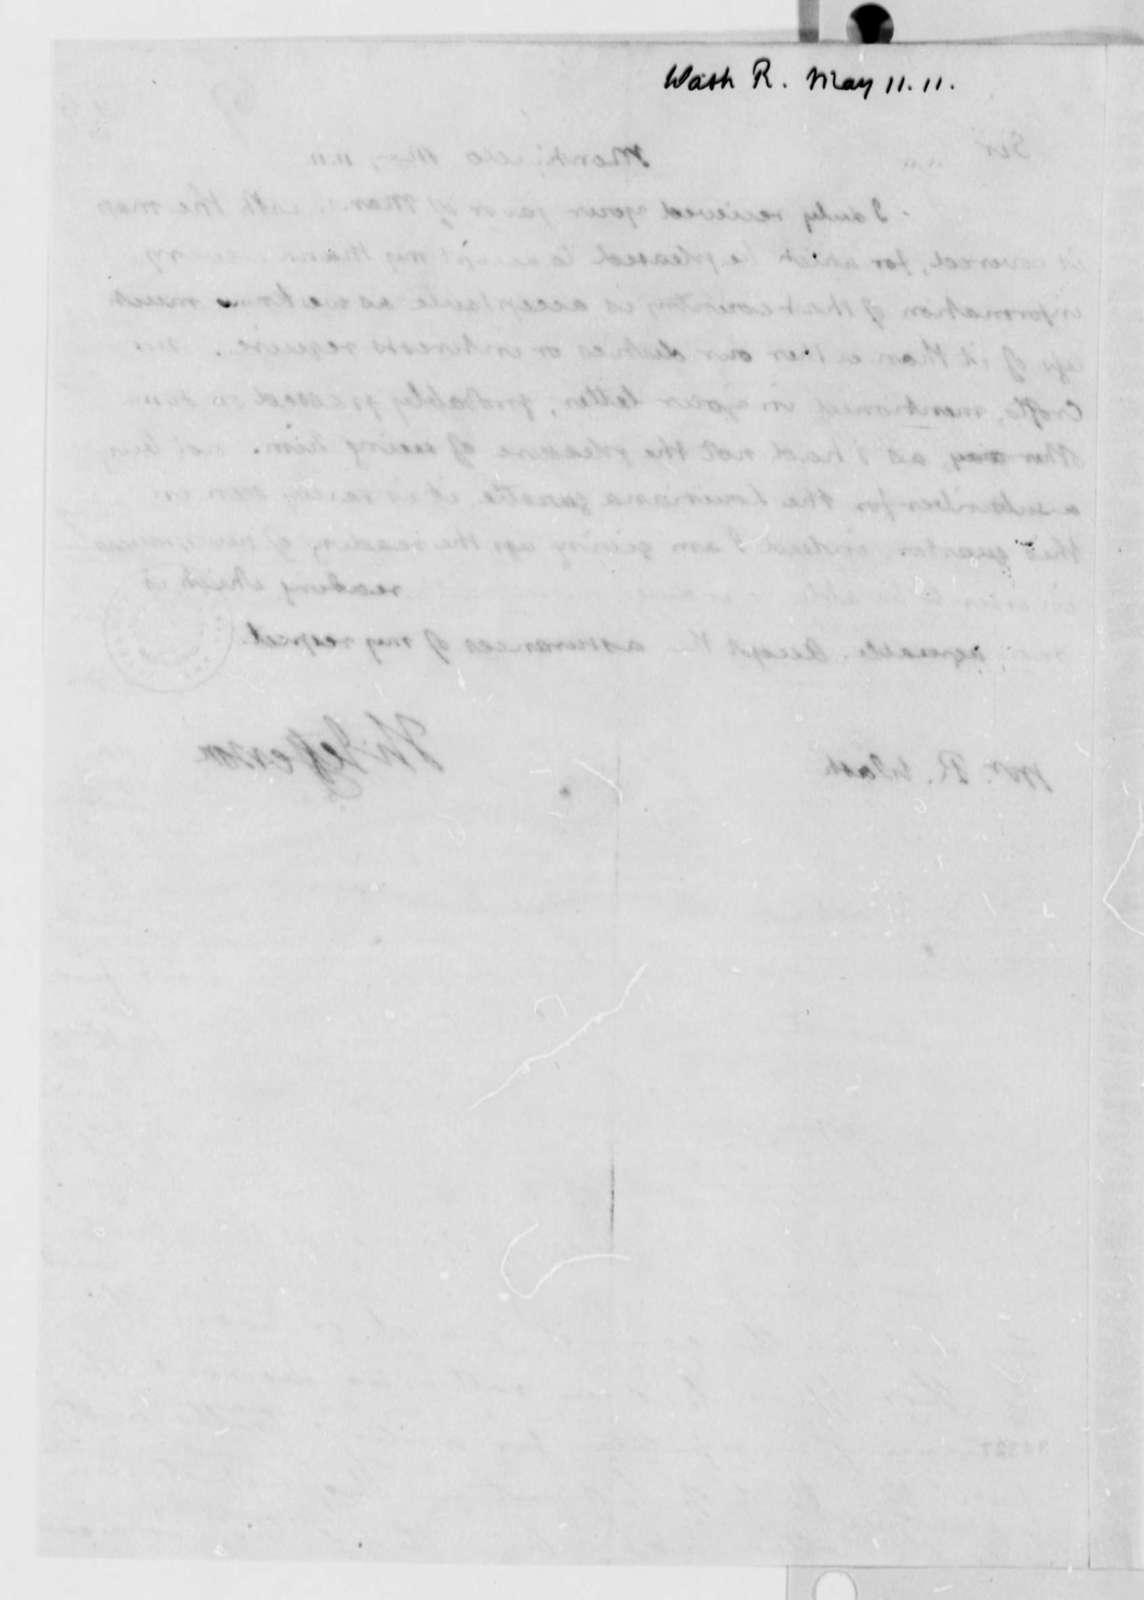 Thomas Jefferson to Robart Wash, May 11, 1811